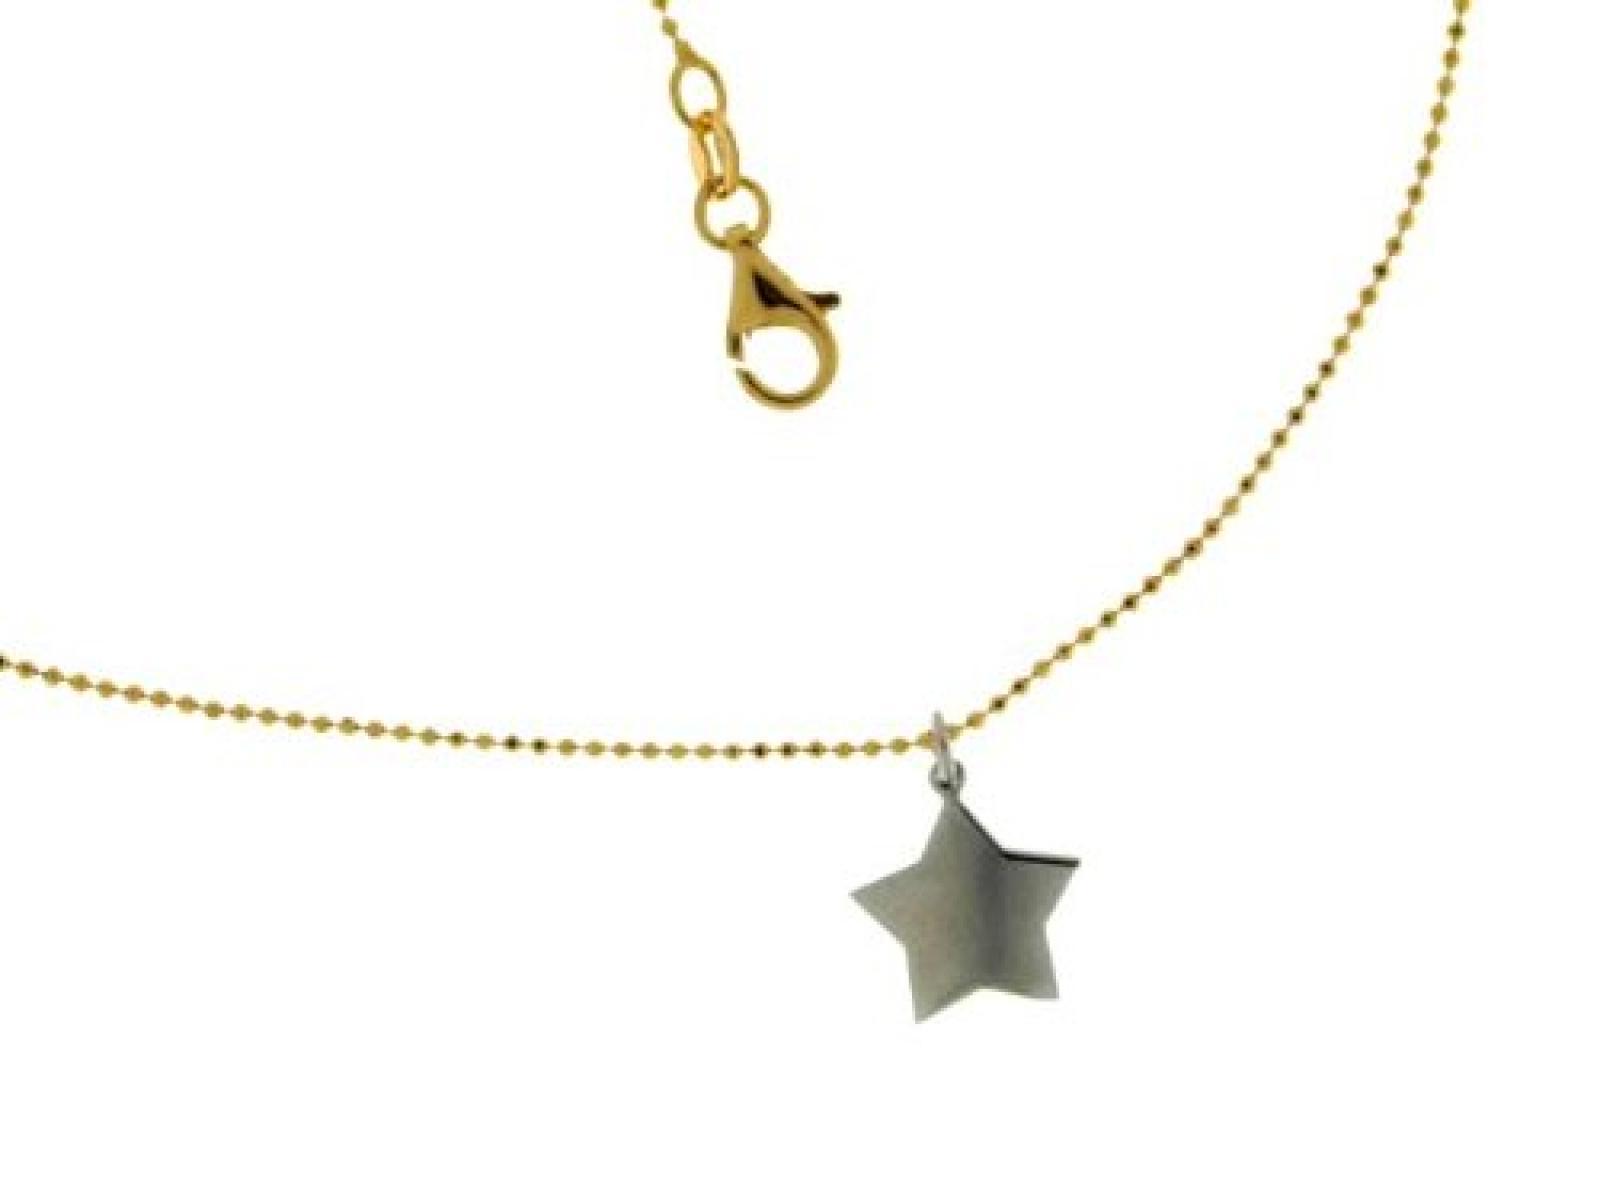 Kettenworld Damen Halskette 925 Sterling Silber 45 cm 316108